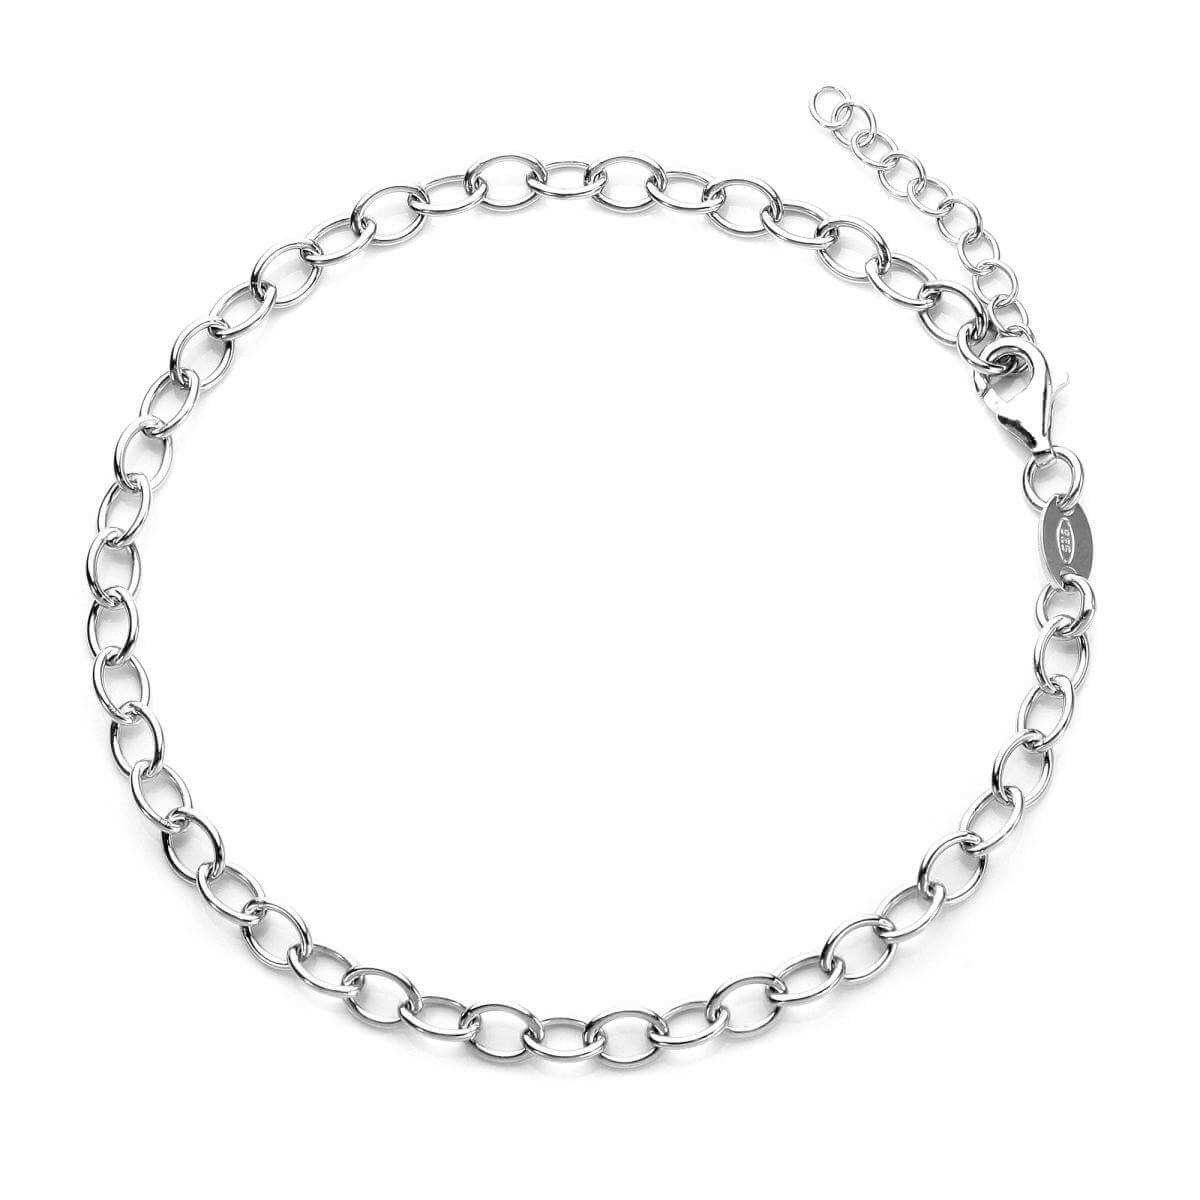 Sterling Silver Rolo Light Charm Bracelet